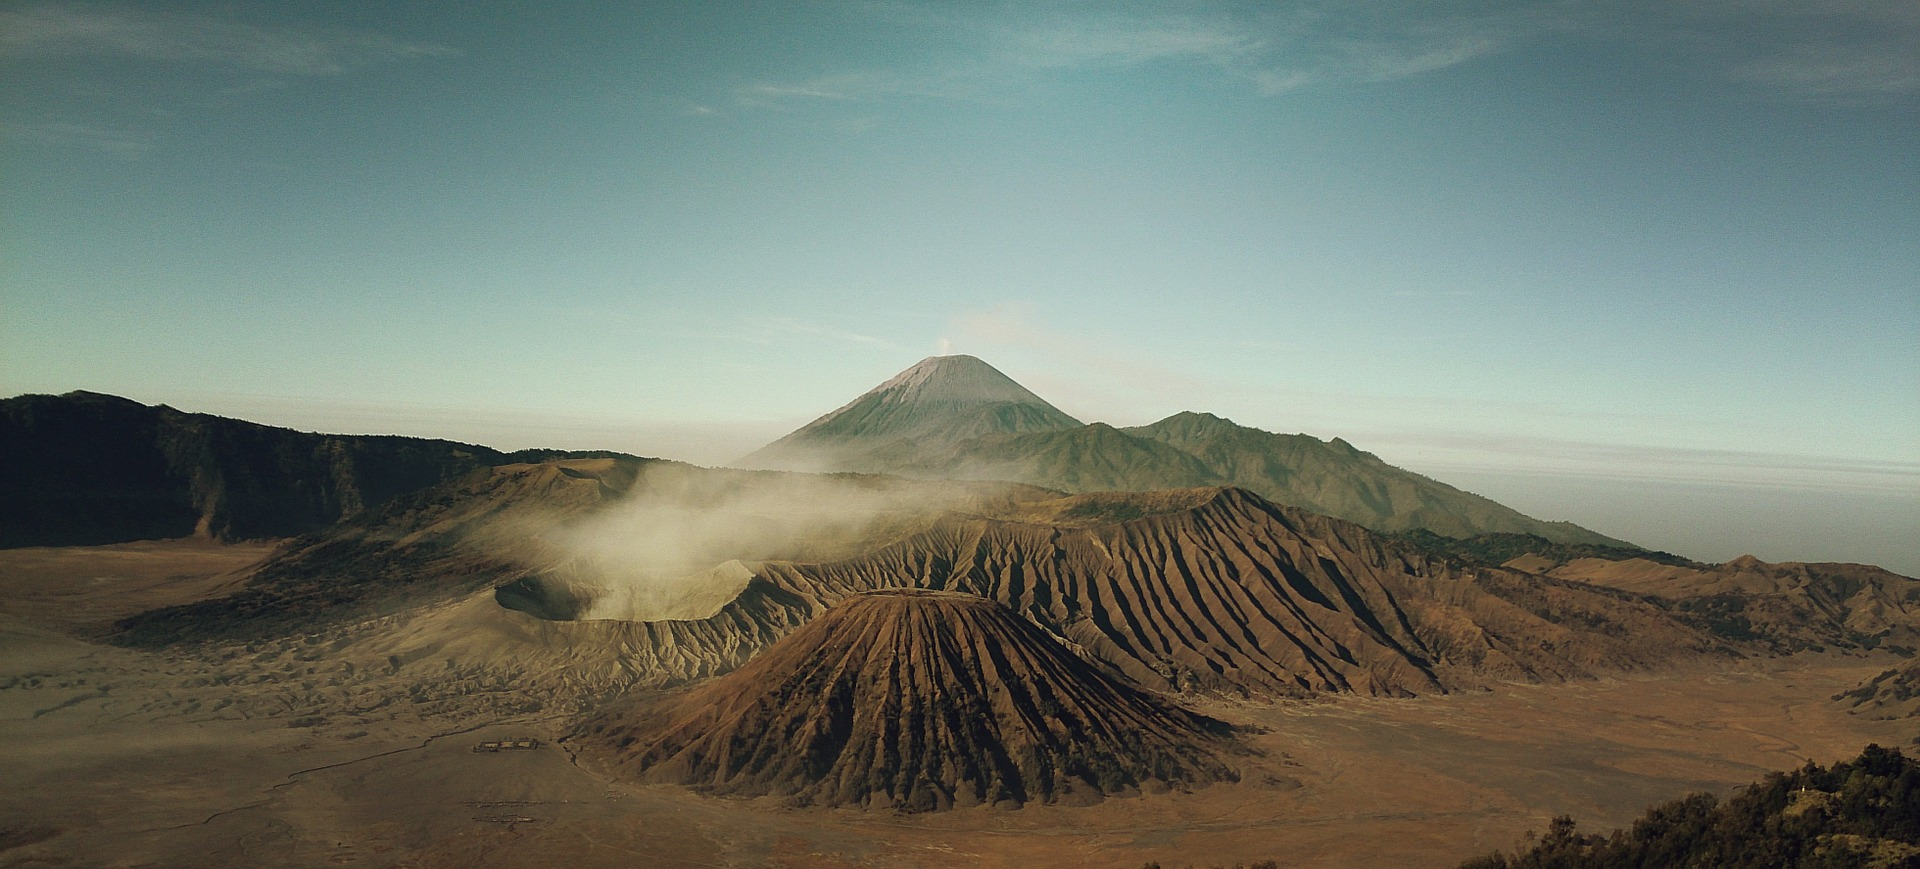 geo volcan Free-Photos / Pixabay